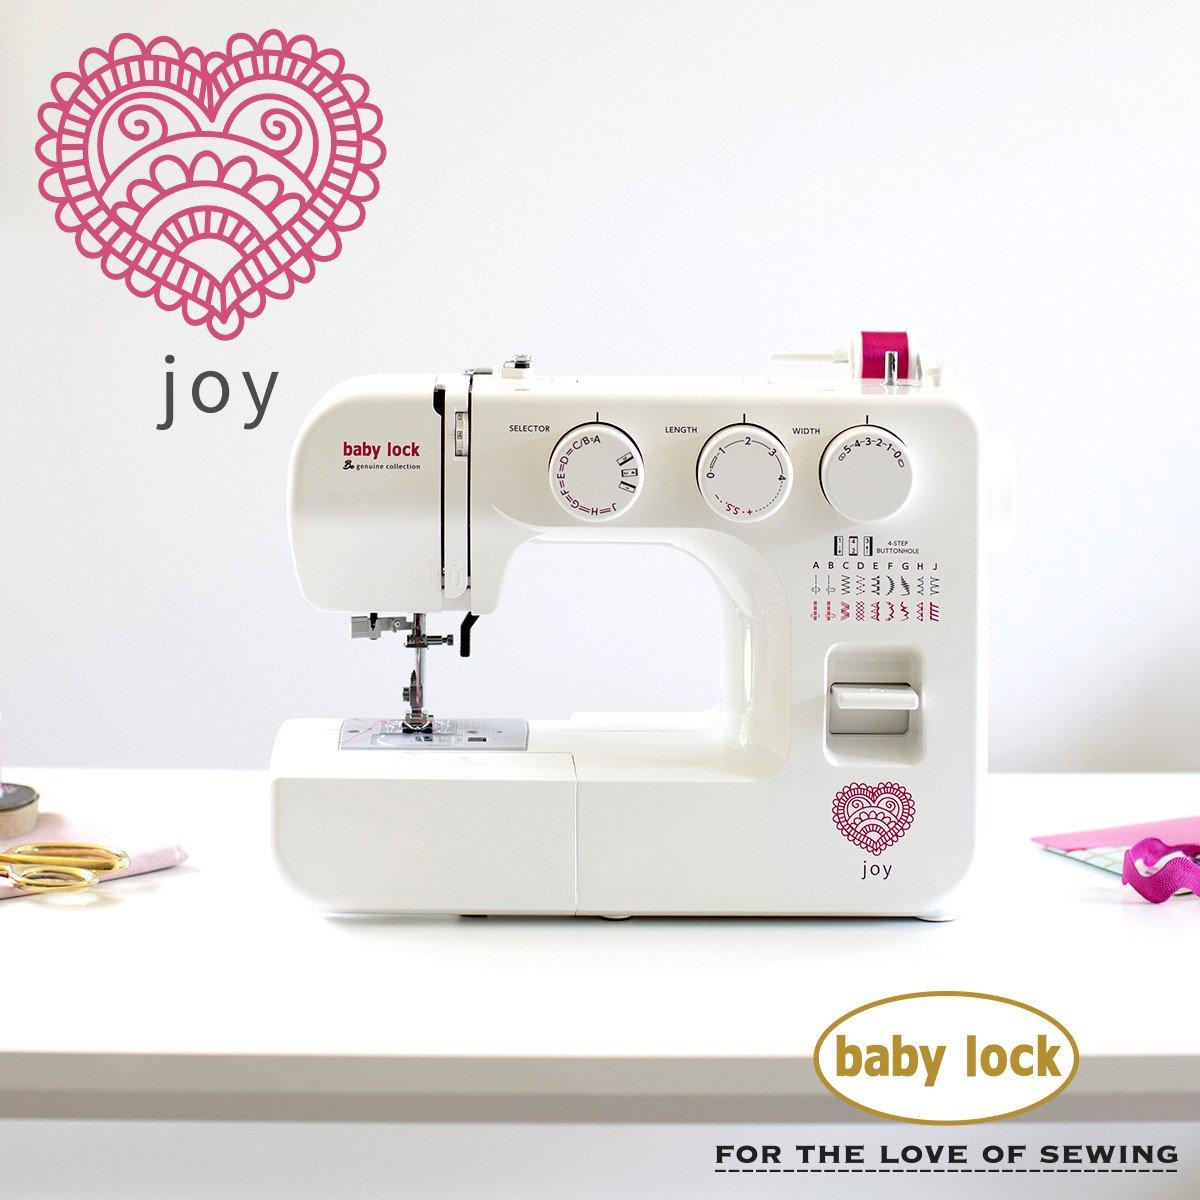 joy genuine collection creekside fabrics